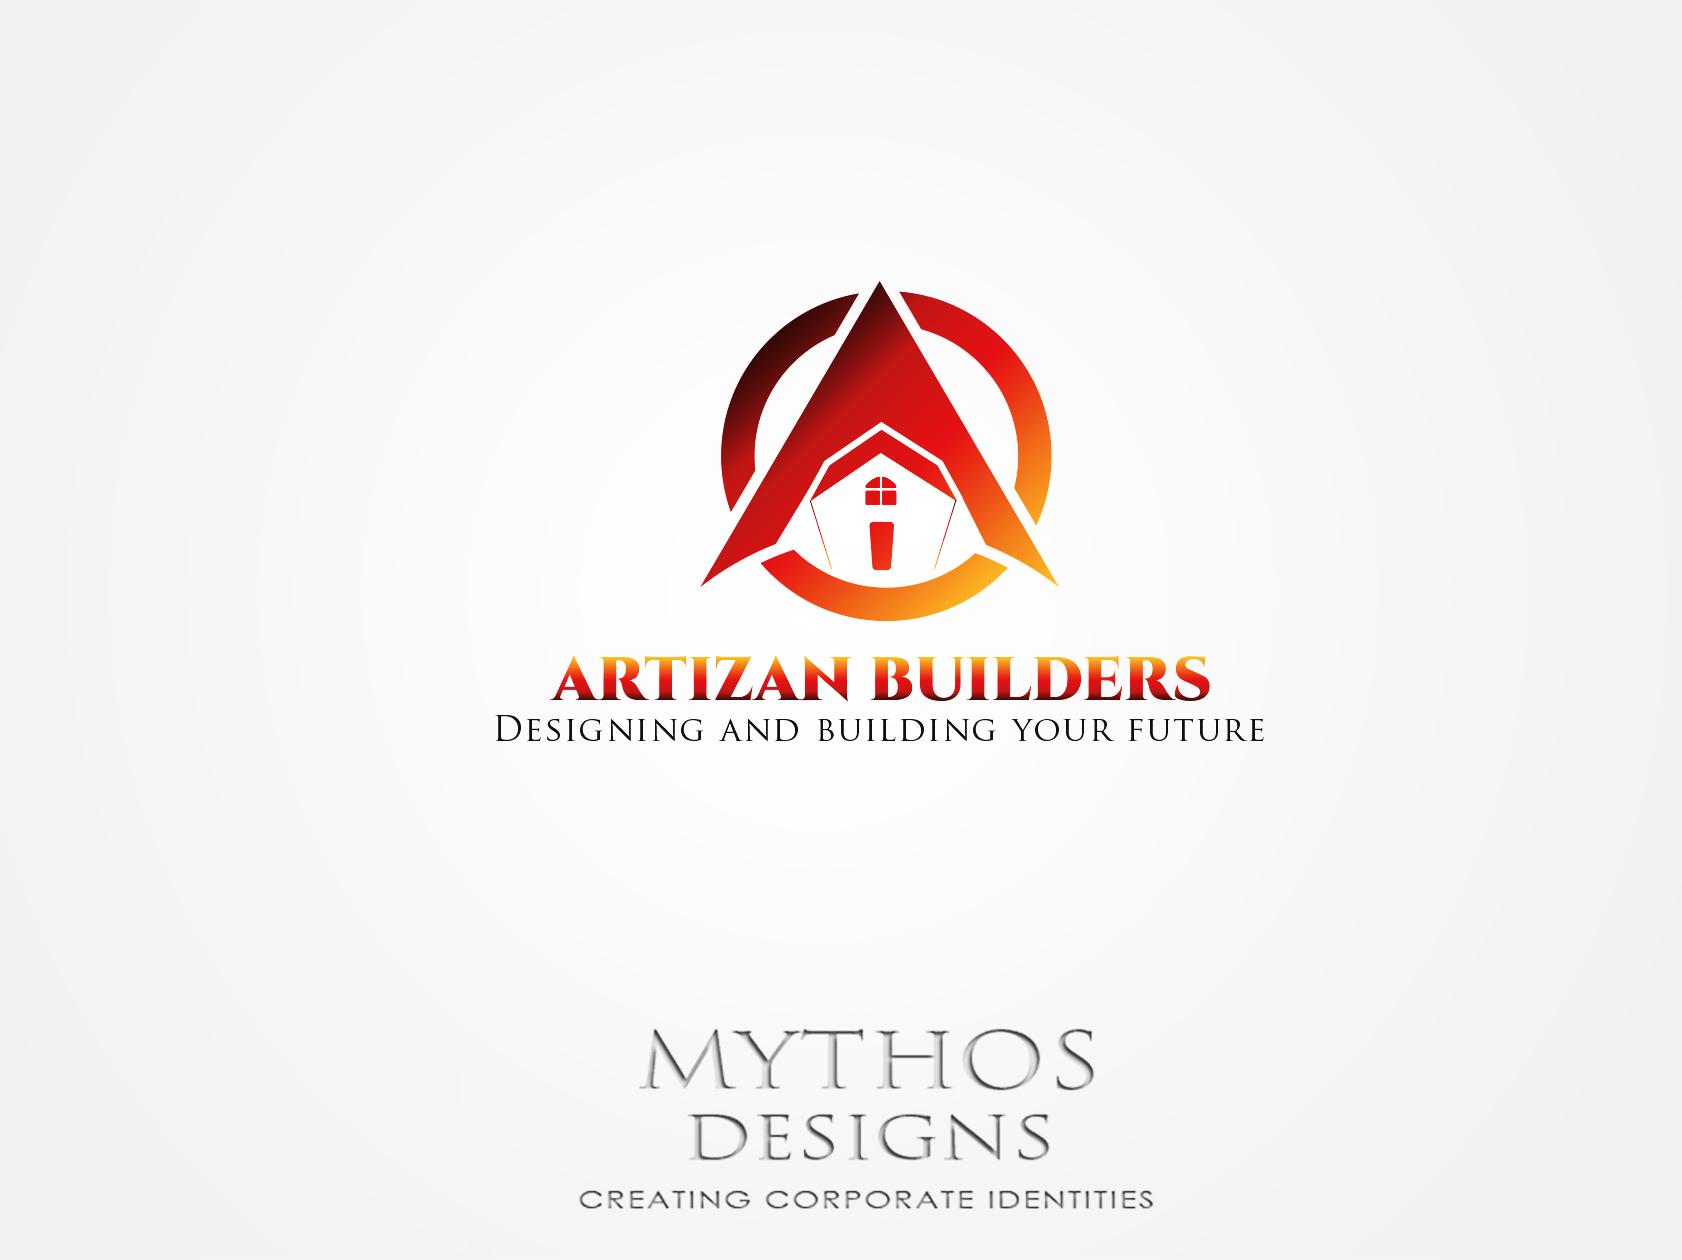 Logo Design by Mythos Designs - Entry No. 210 in the Logo Design Contest Captivating Logo Design for Artisan Builders.